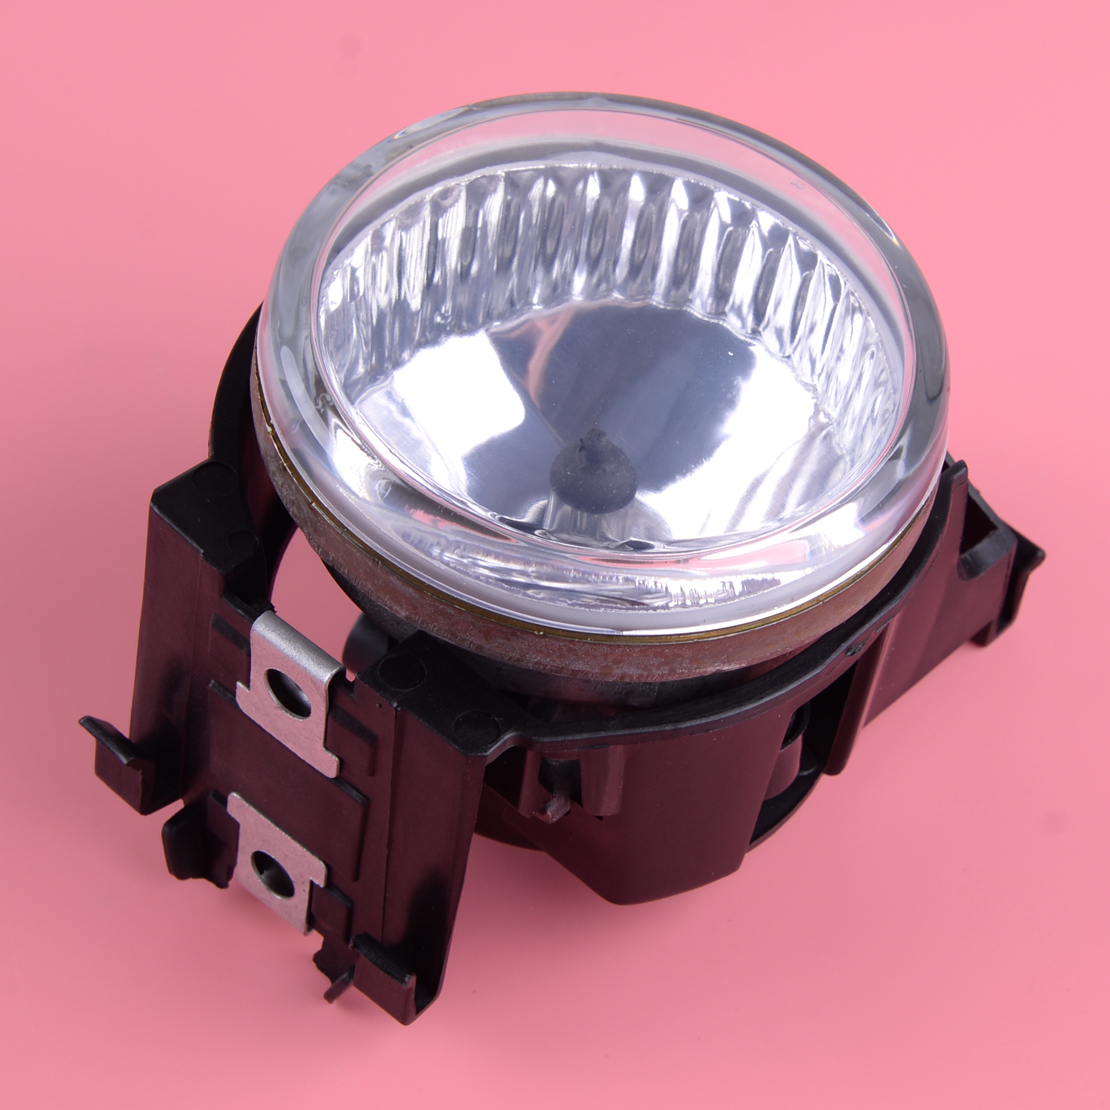 DWCX 2 Pin Amber Right Front Bumper Fog Light Lamp Fit For Subaru Impreza WRX STI Legacy 84501AG150